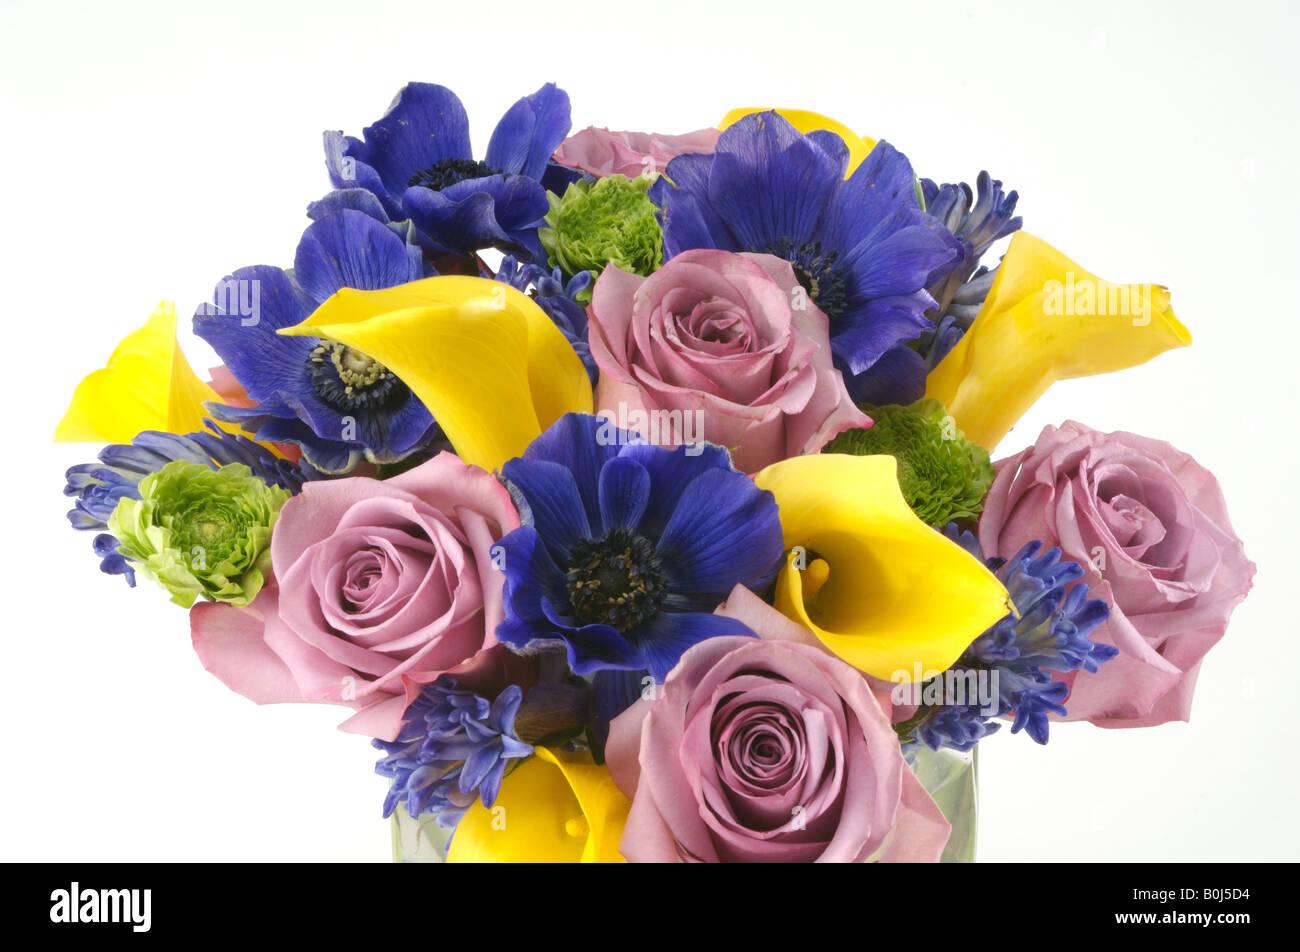 Welcome flowers bouquet stock photos welcome flowers bouquet stock a bouquet of pretty flowers stock image izmirmasajfo